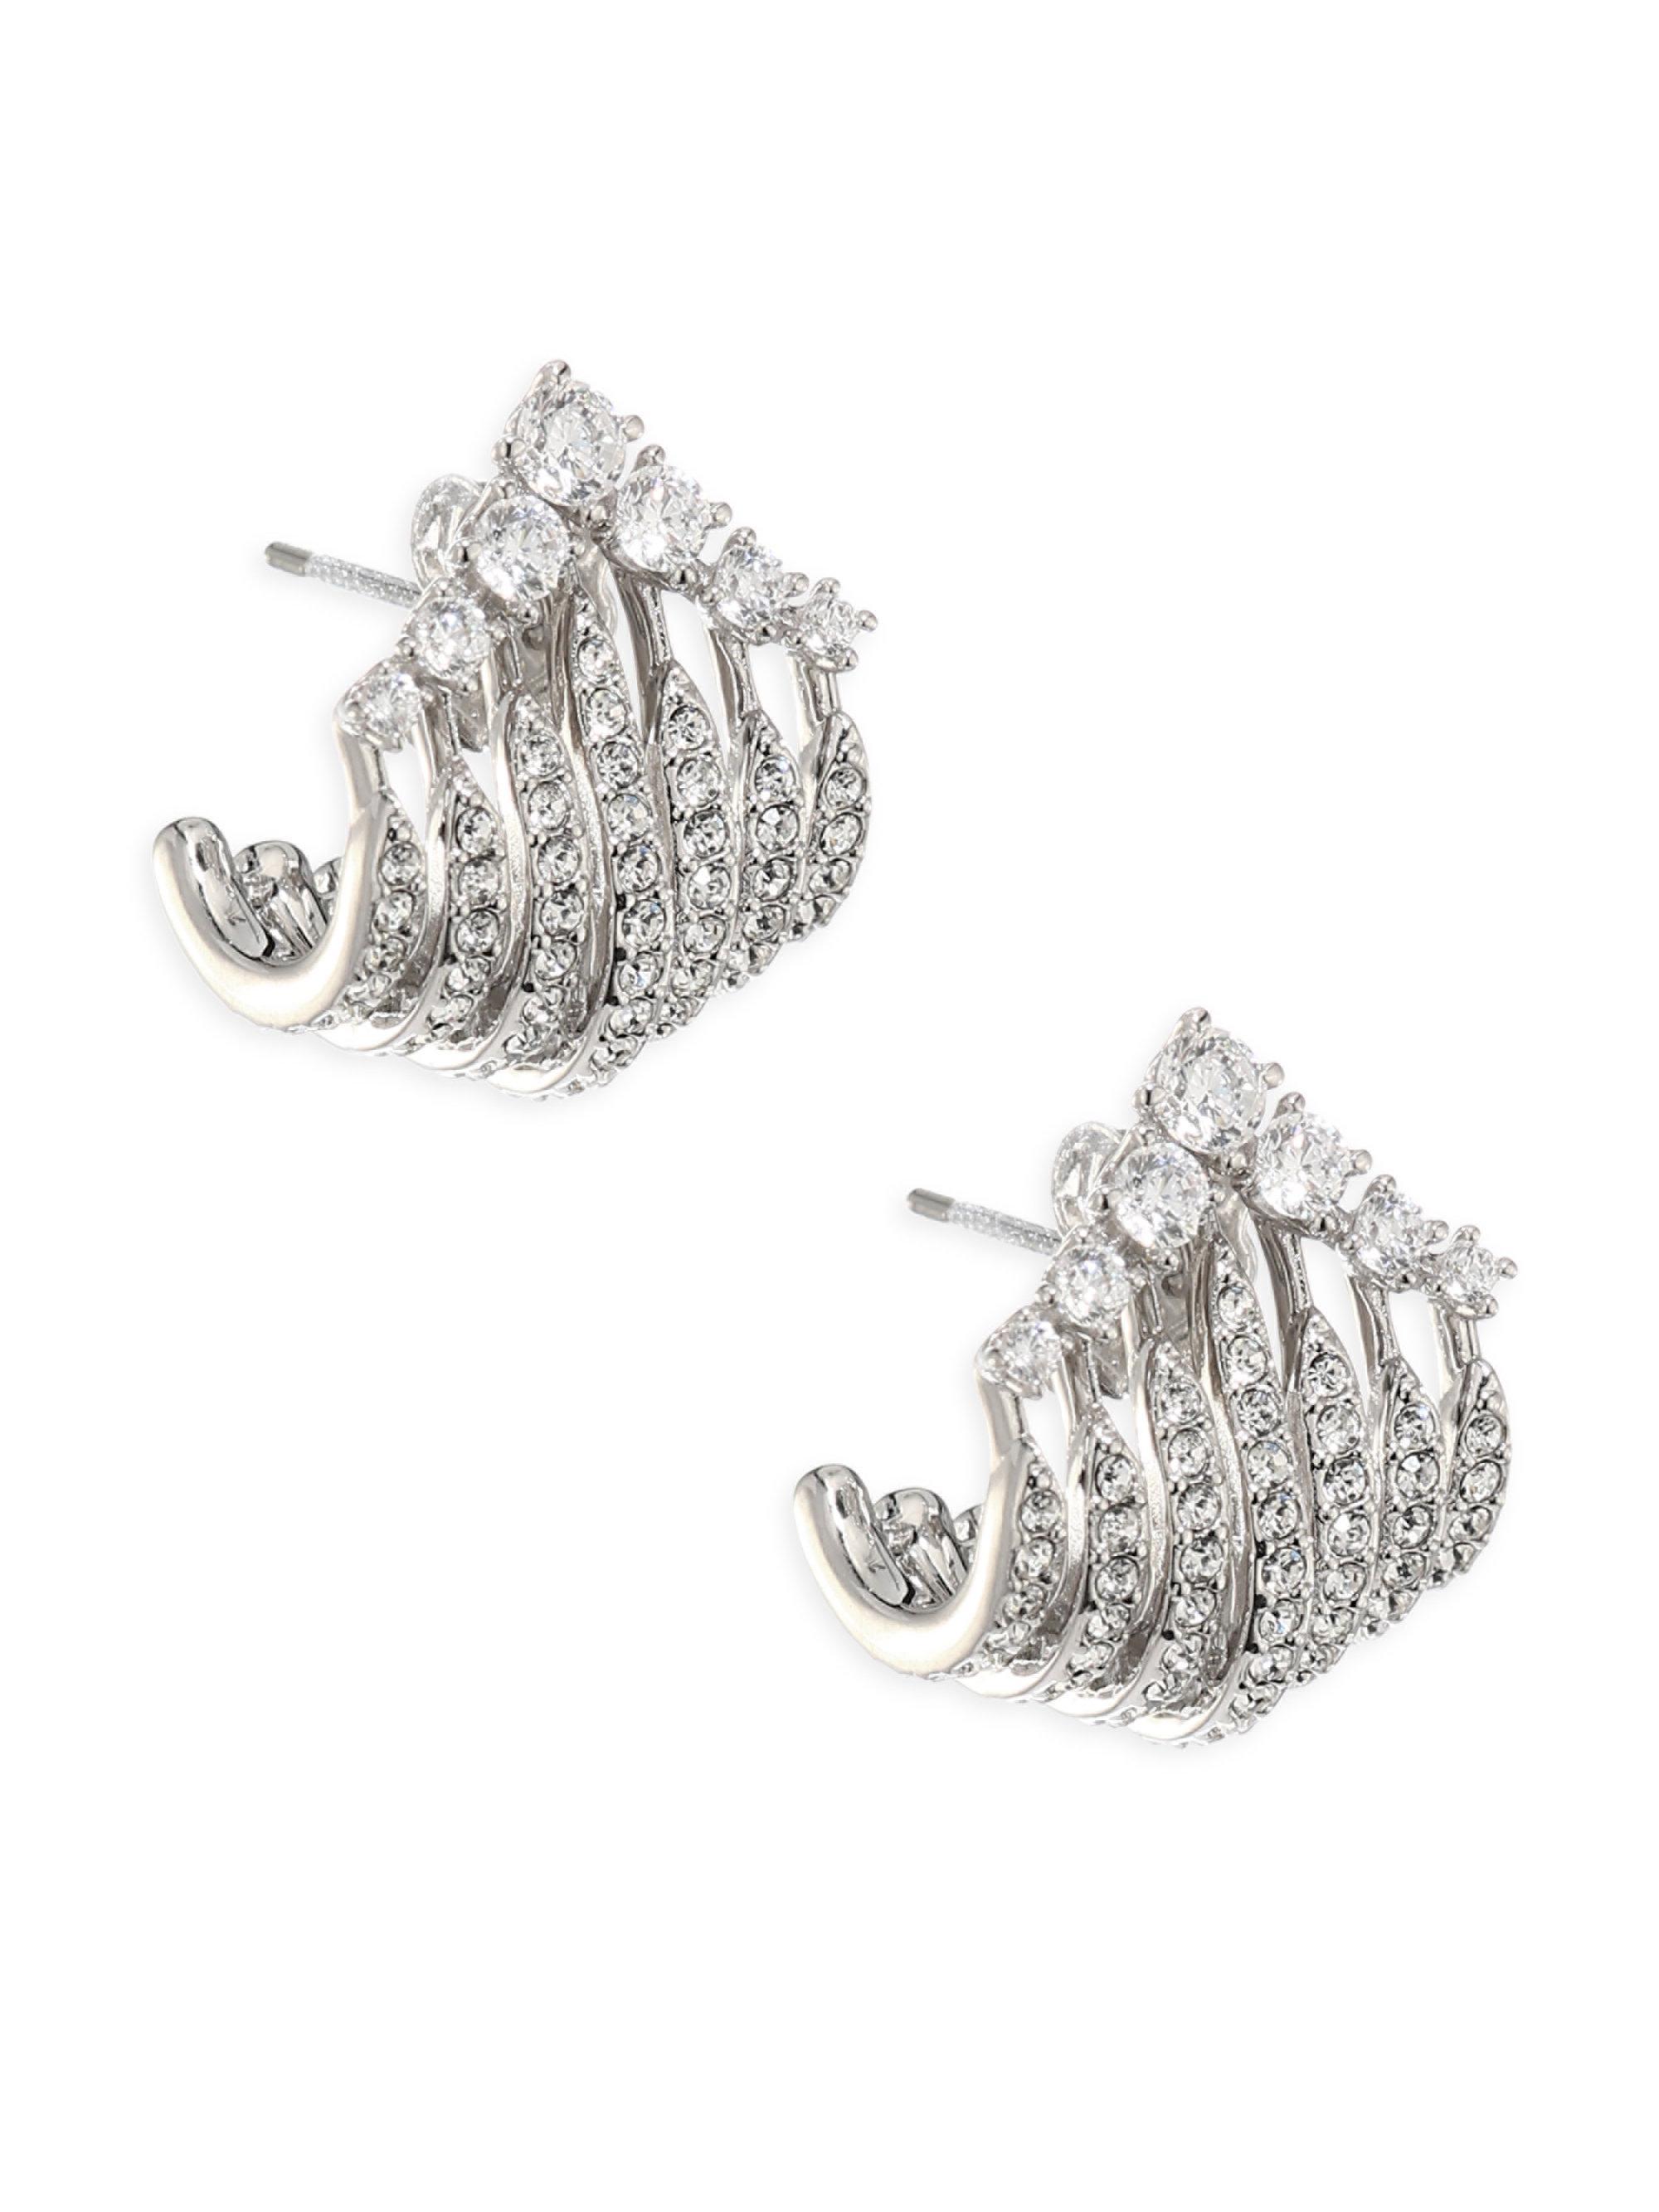 Image result for Adriana Orsini Greta Wrap Crystal Earrings